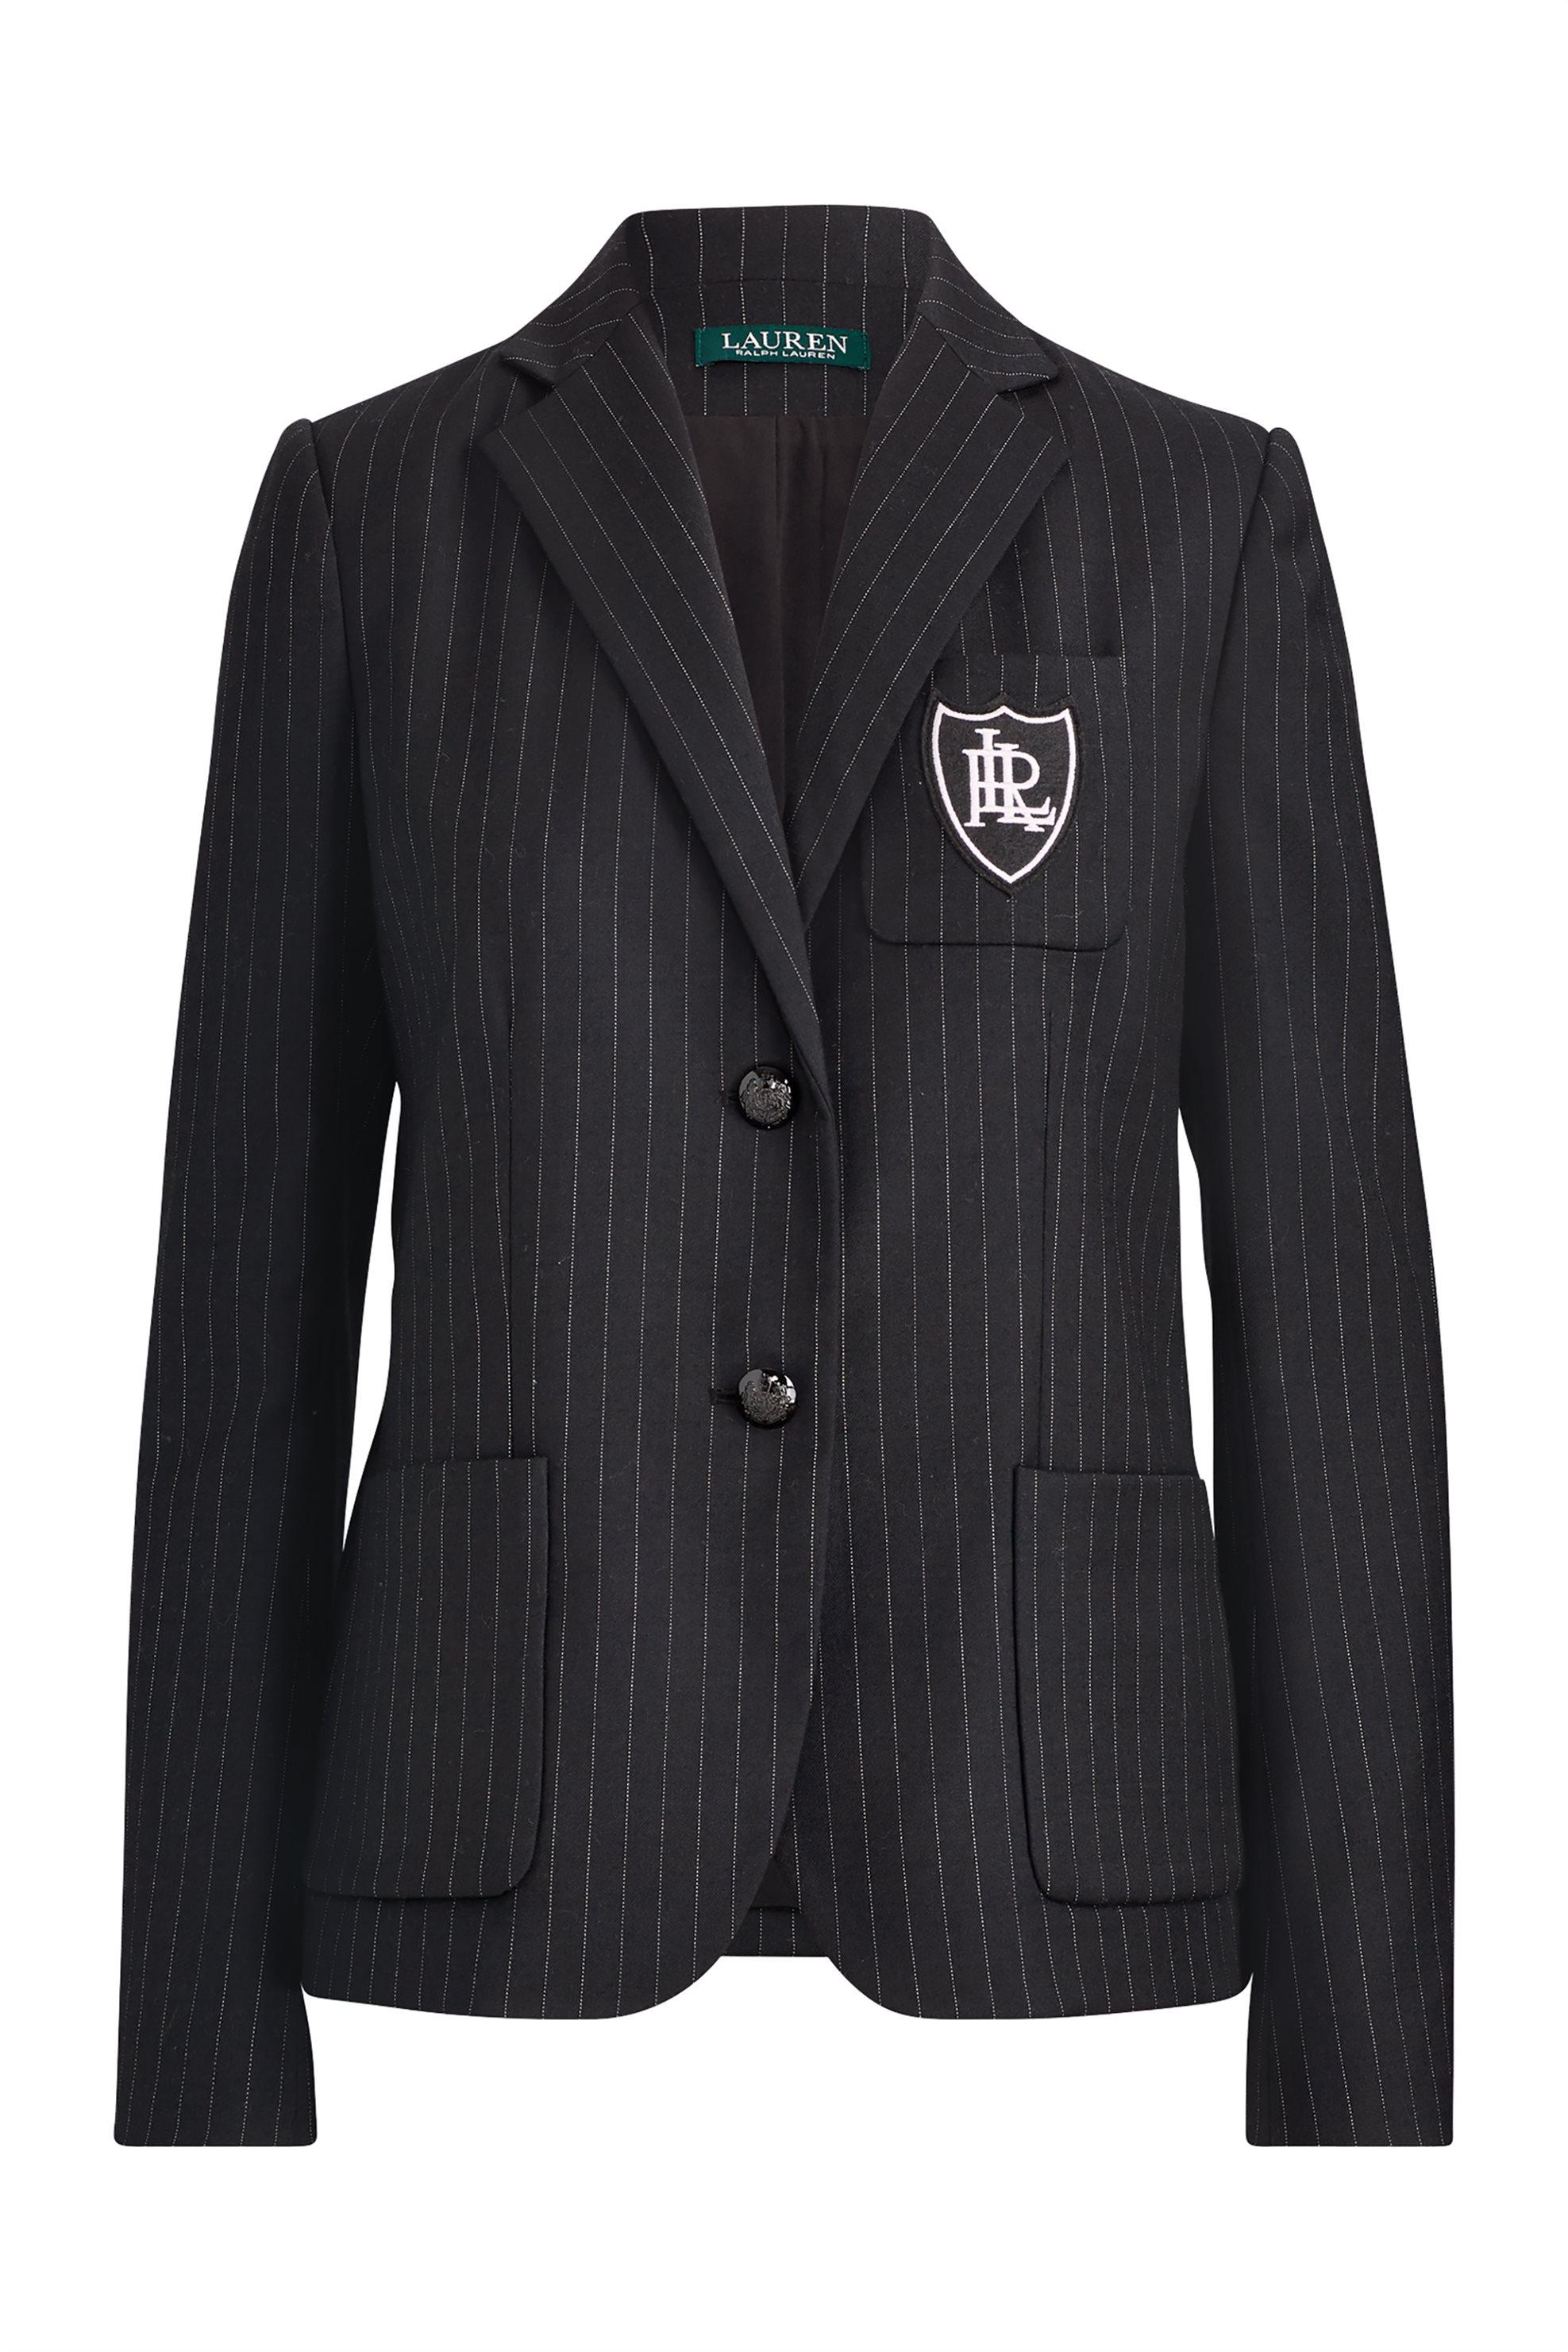 ae29c2984137 Lauren Ralph Lauren γυναικείο ριγέ σακάκι Pinstripe Wool-Blend -  200726126001 - Μαύρο